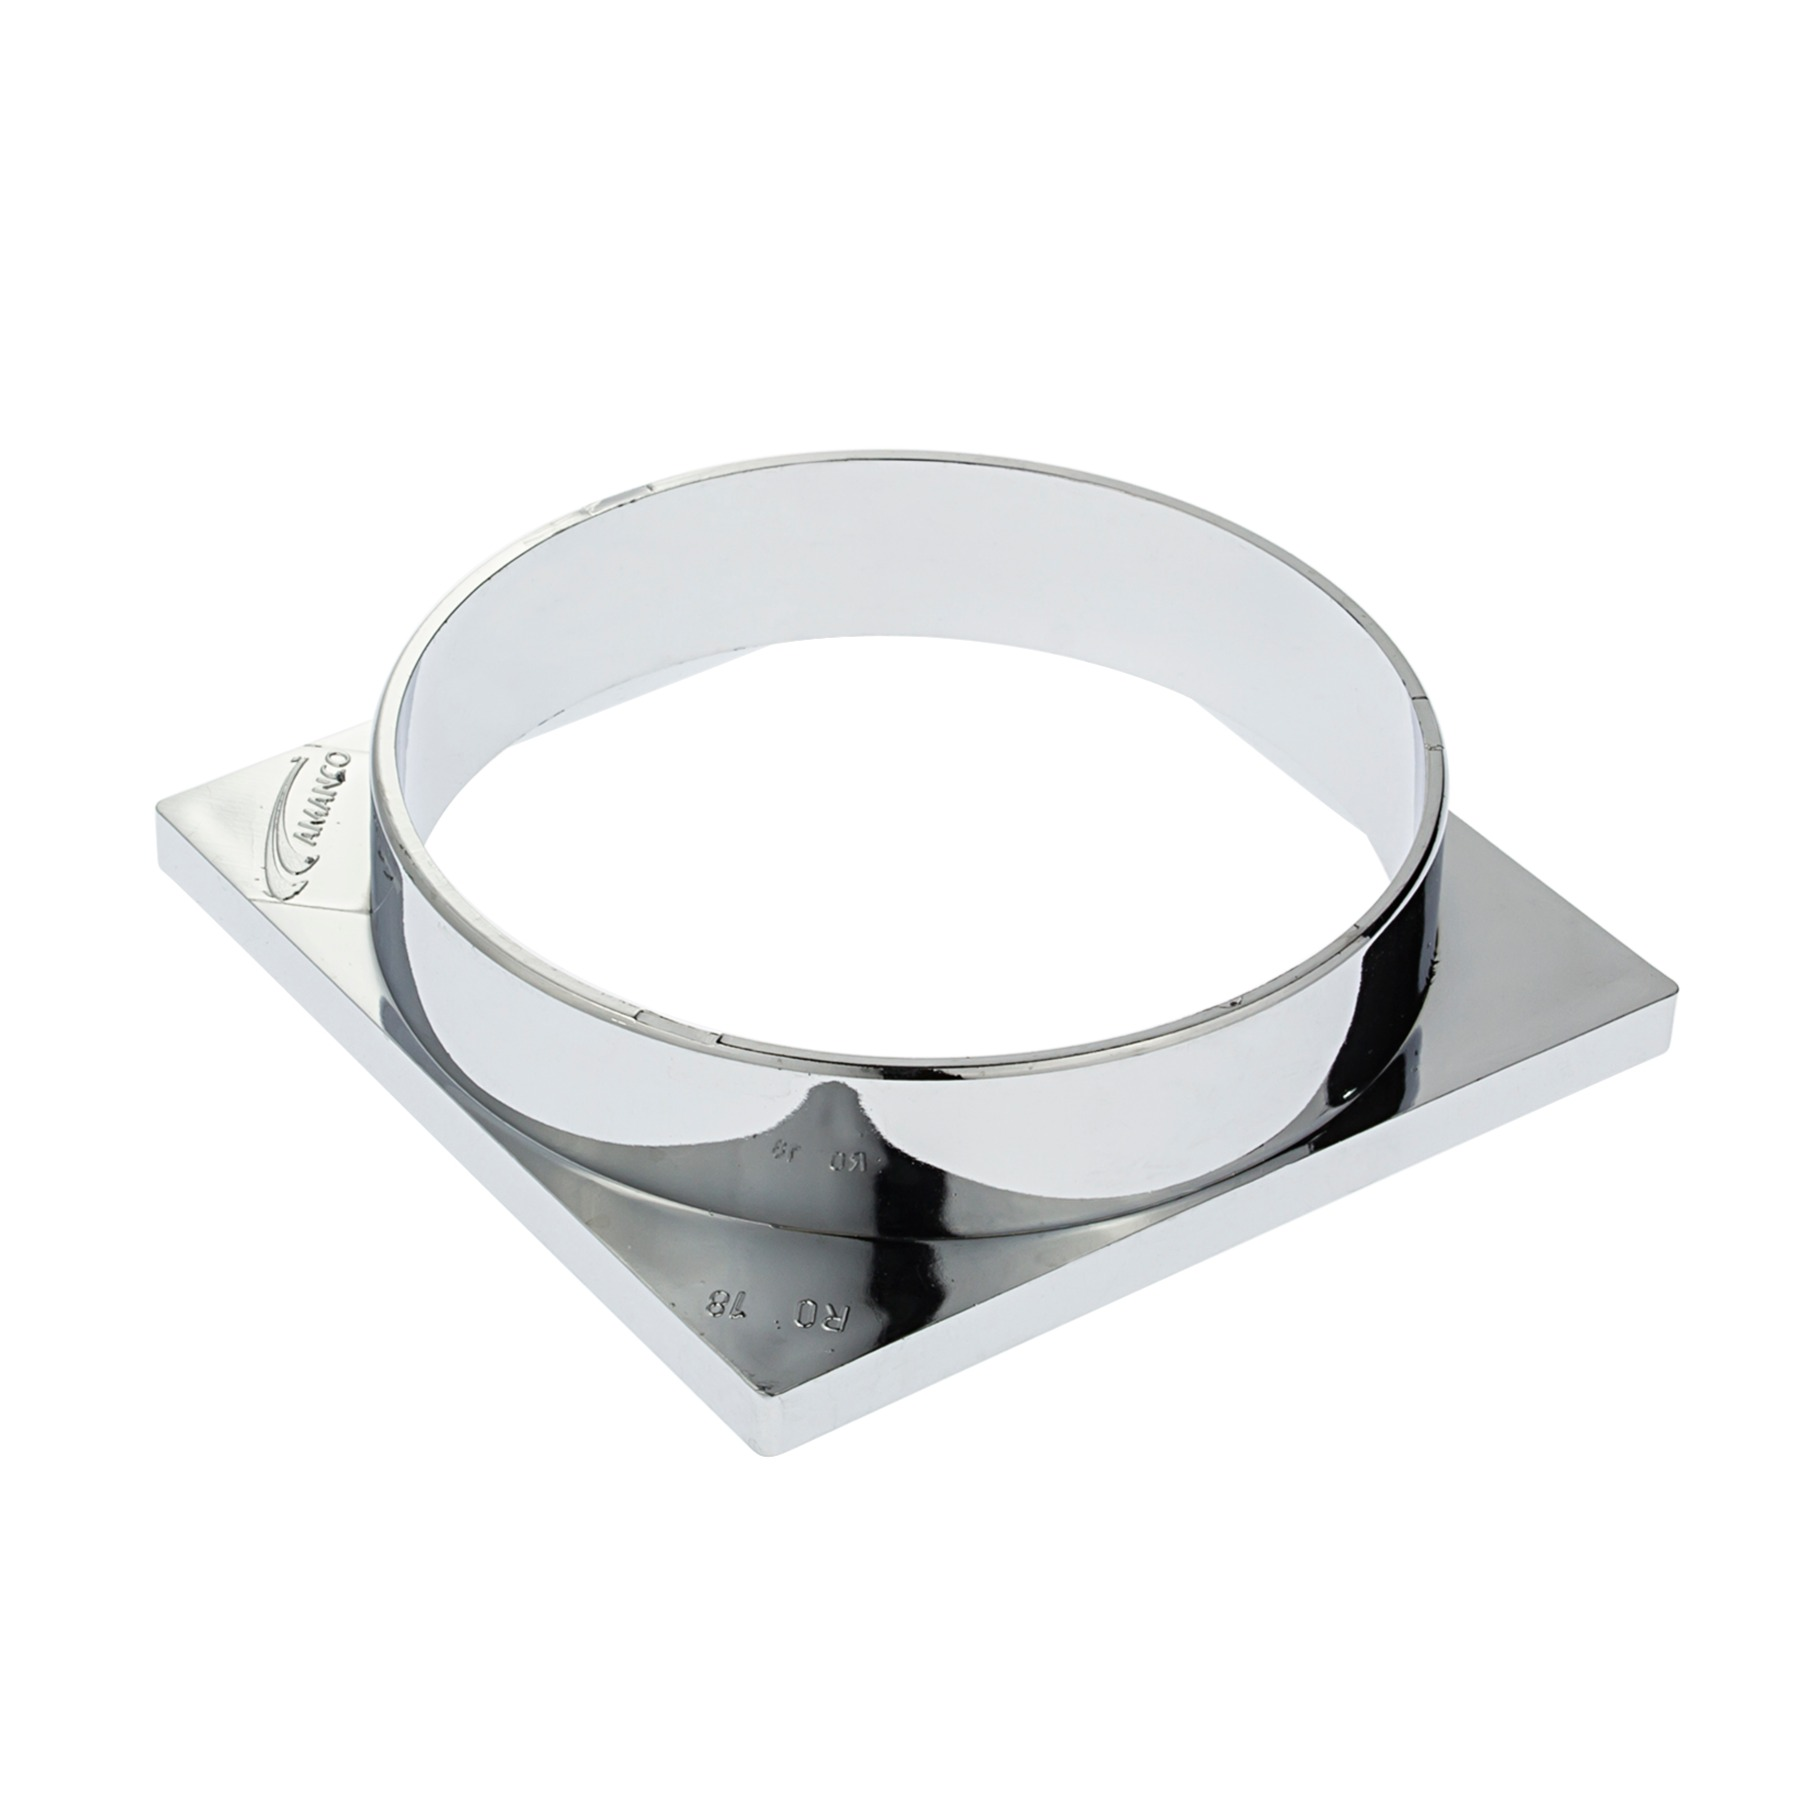 Porta-Grelha Caixa Sifonada 100 mm Quadrado 90608 - Amanco